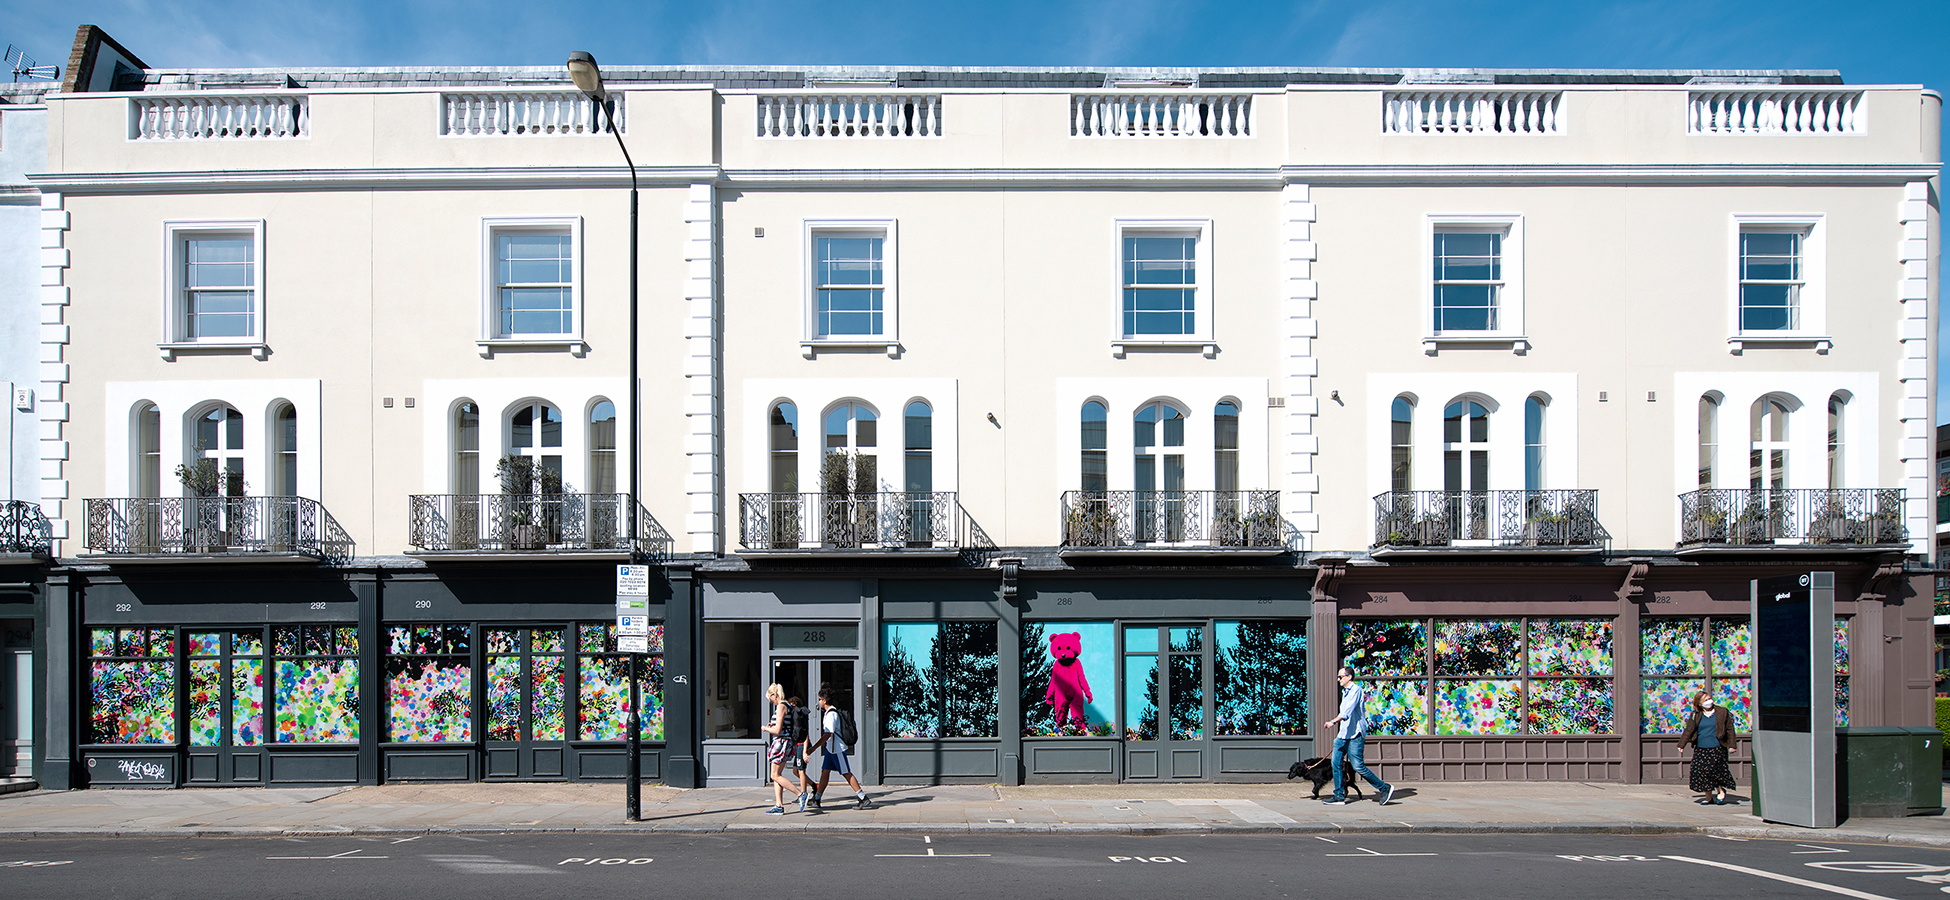 Good Vibrations - Mural - Notting Hill